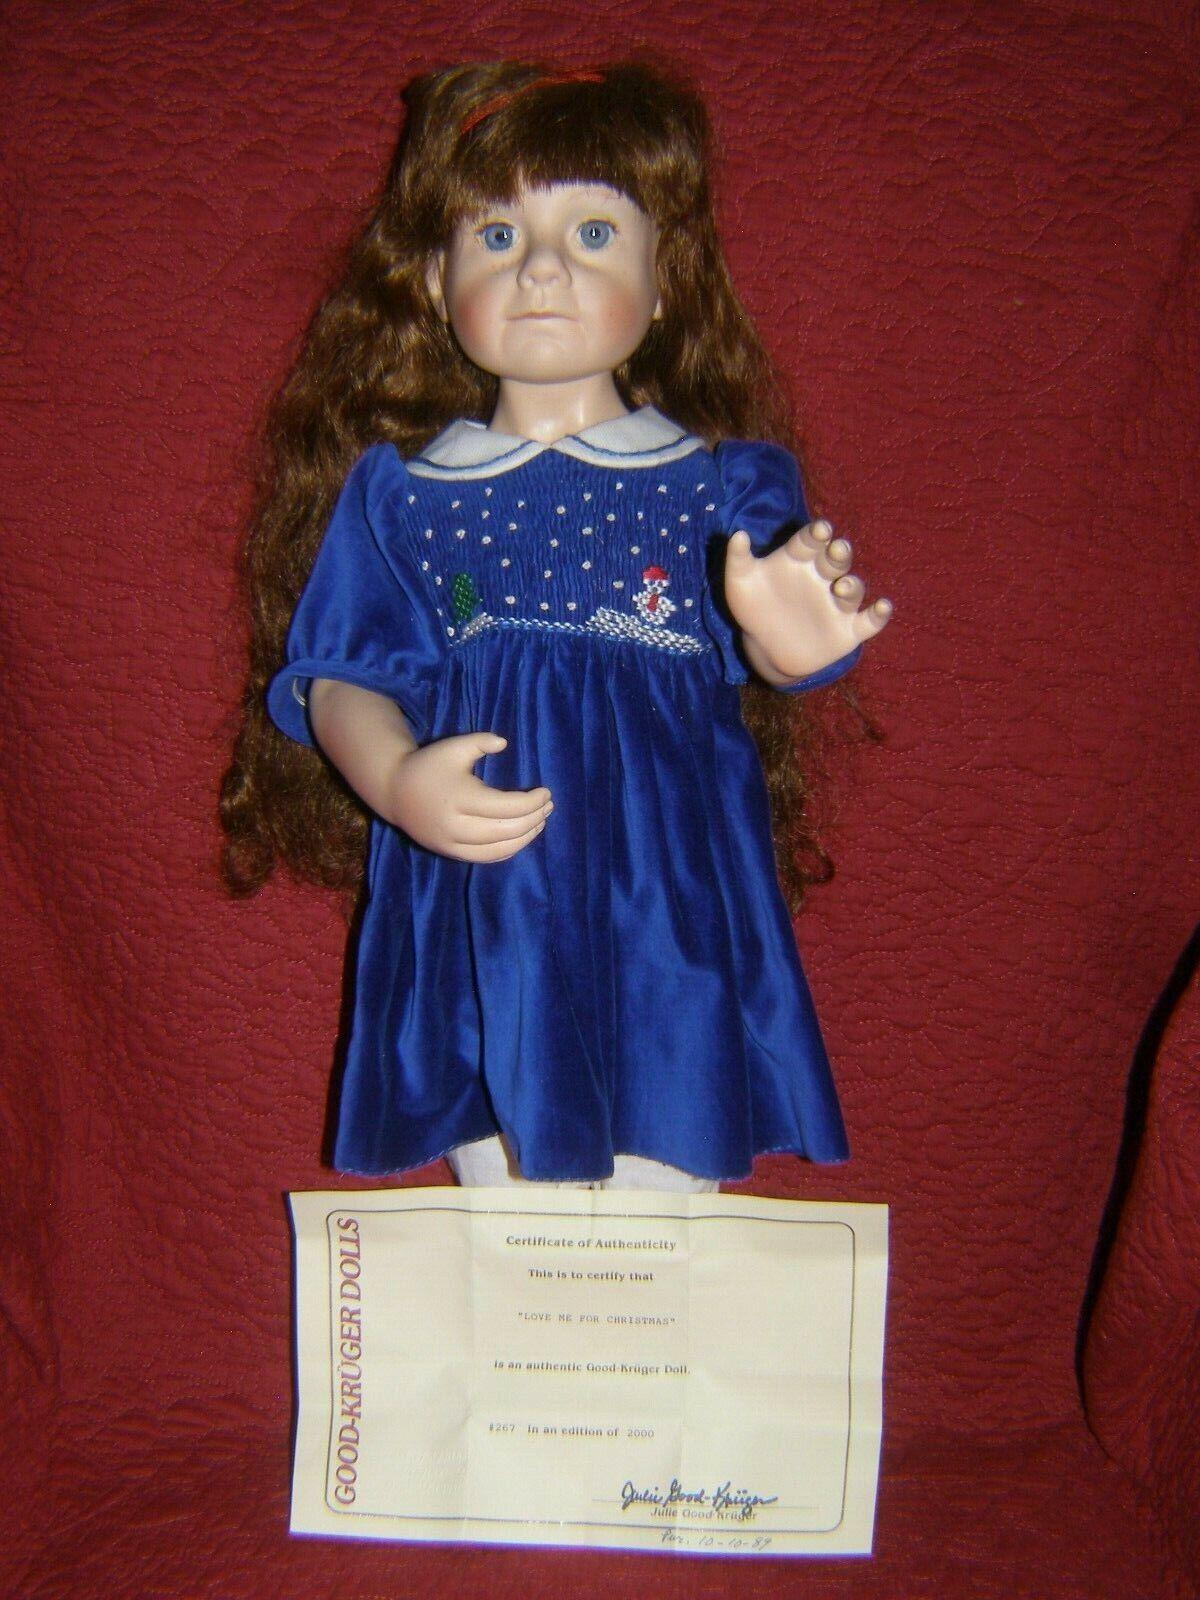 GOOD-KRUGER Love Me For Christmas Ltd Ed 267 21 Inch Doll - $58.99